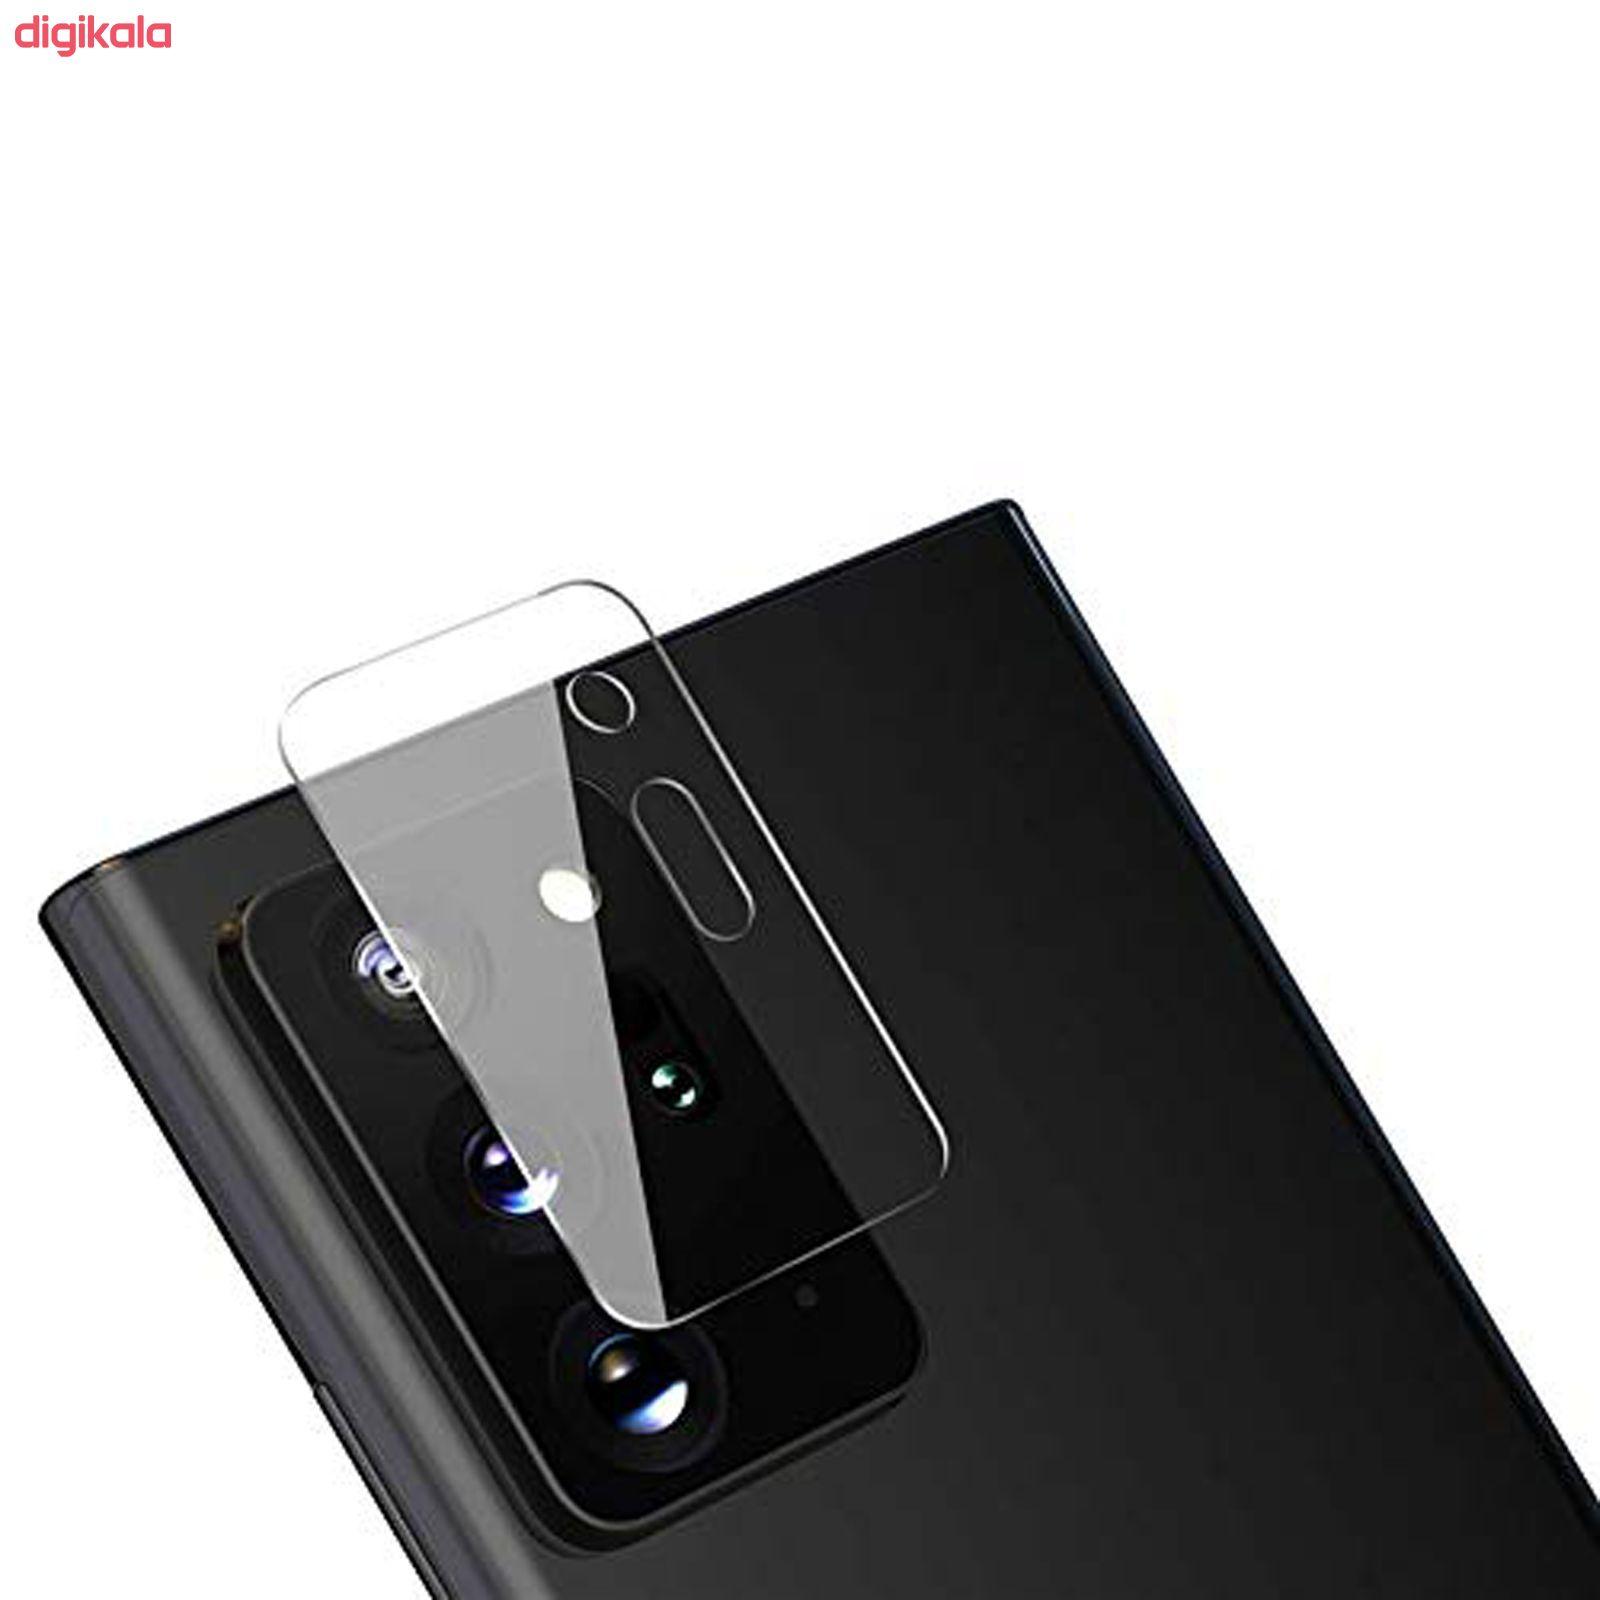 محافظ لنز دوربین سیحان مدل GLP مناسب برای گوشی موبایل سامسونگ Galaxy Note 20 Ultra main 1 1